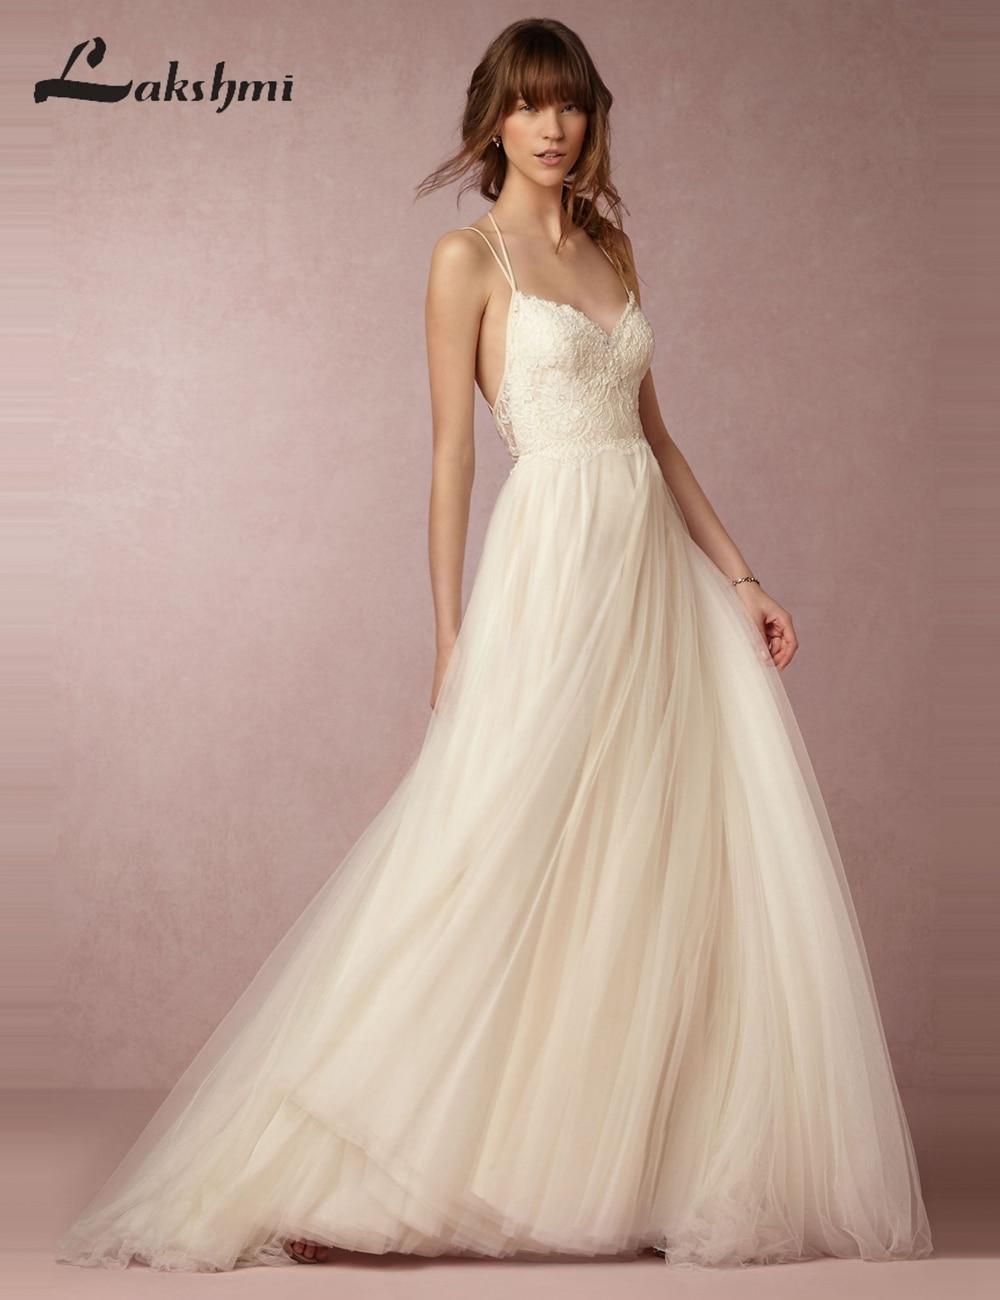 Medium Crop Of Vintage Wedding Dress